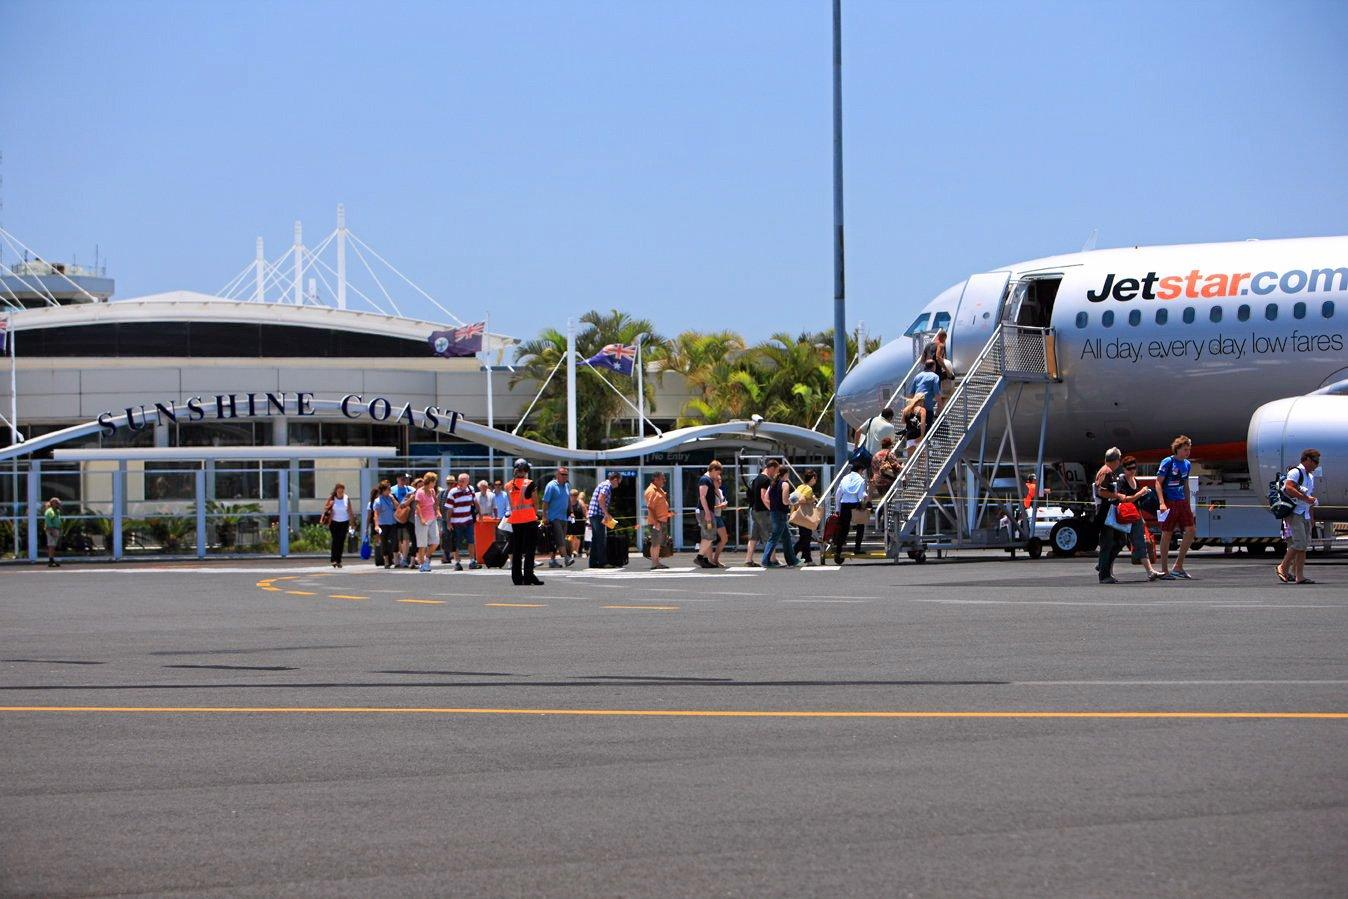 A Jetstar flight arrives on the Sunshine Coast